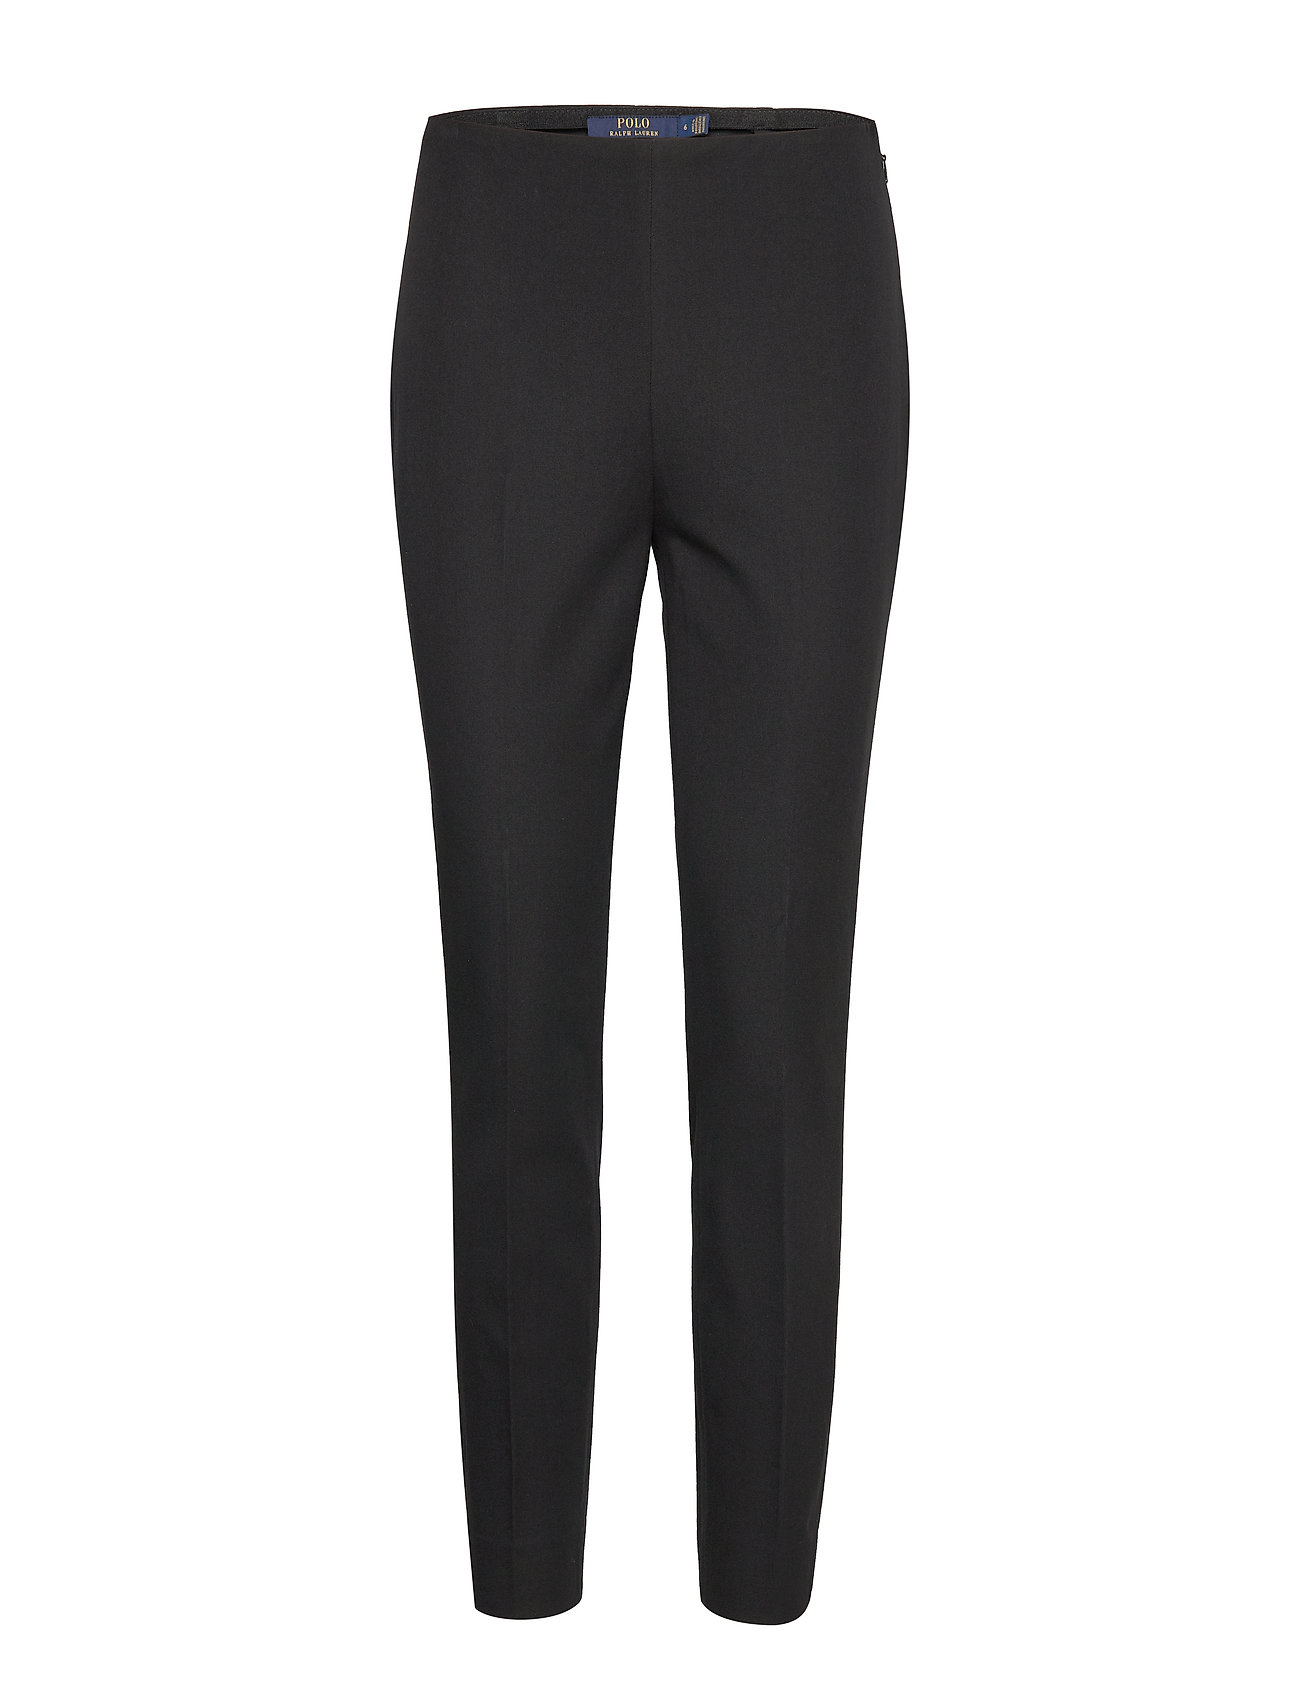 Polo Ralph Lauren Bi-Stretch Skinny Pant - POLO BLACK